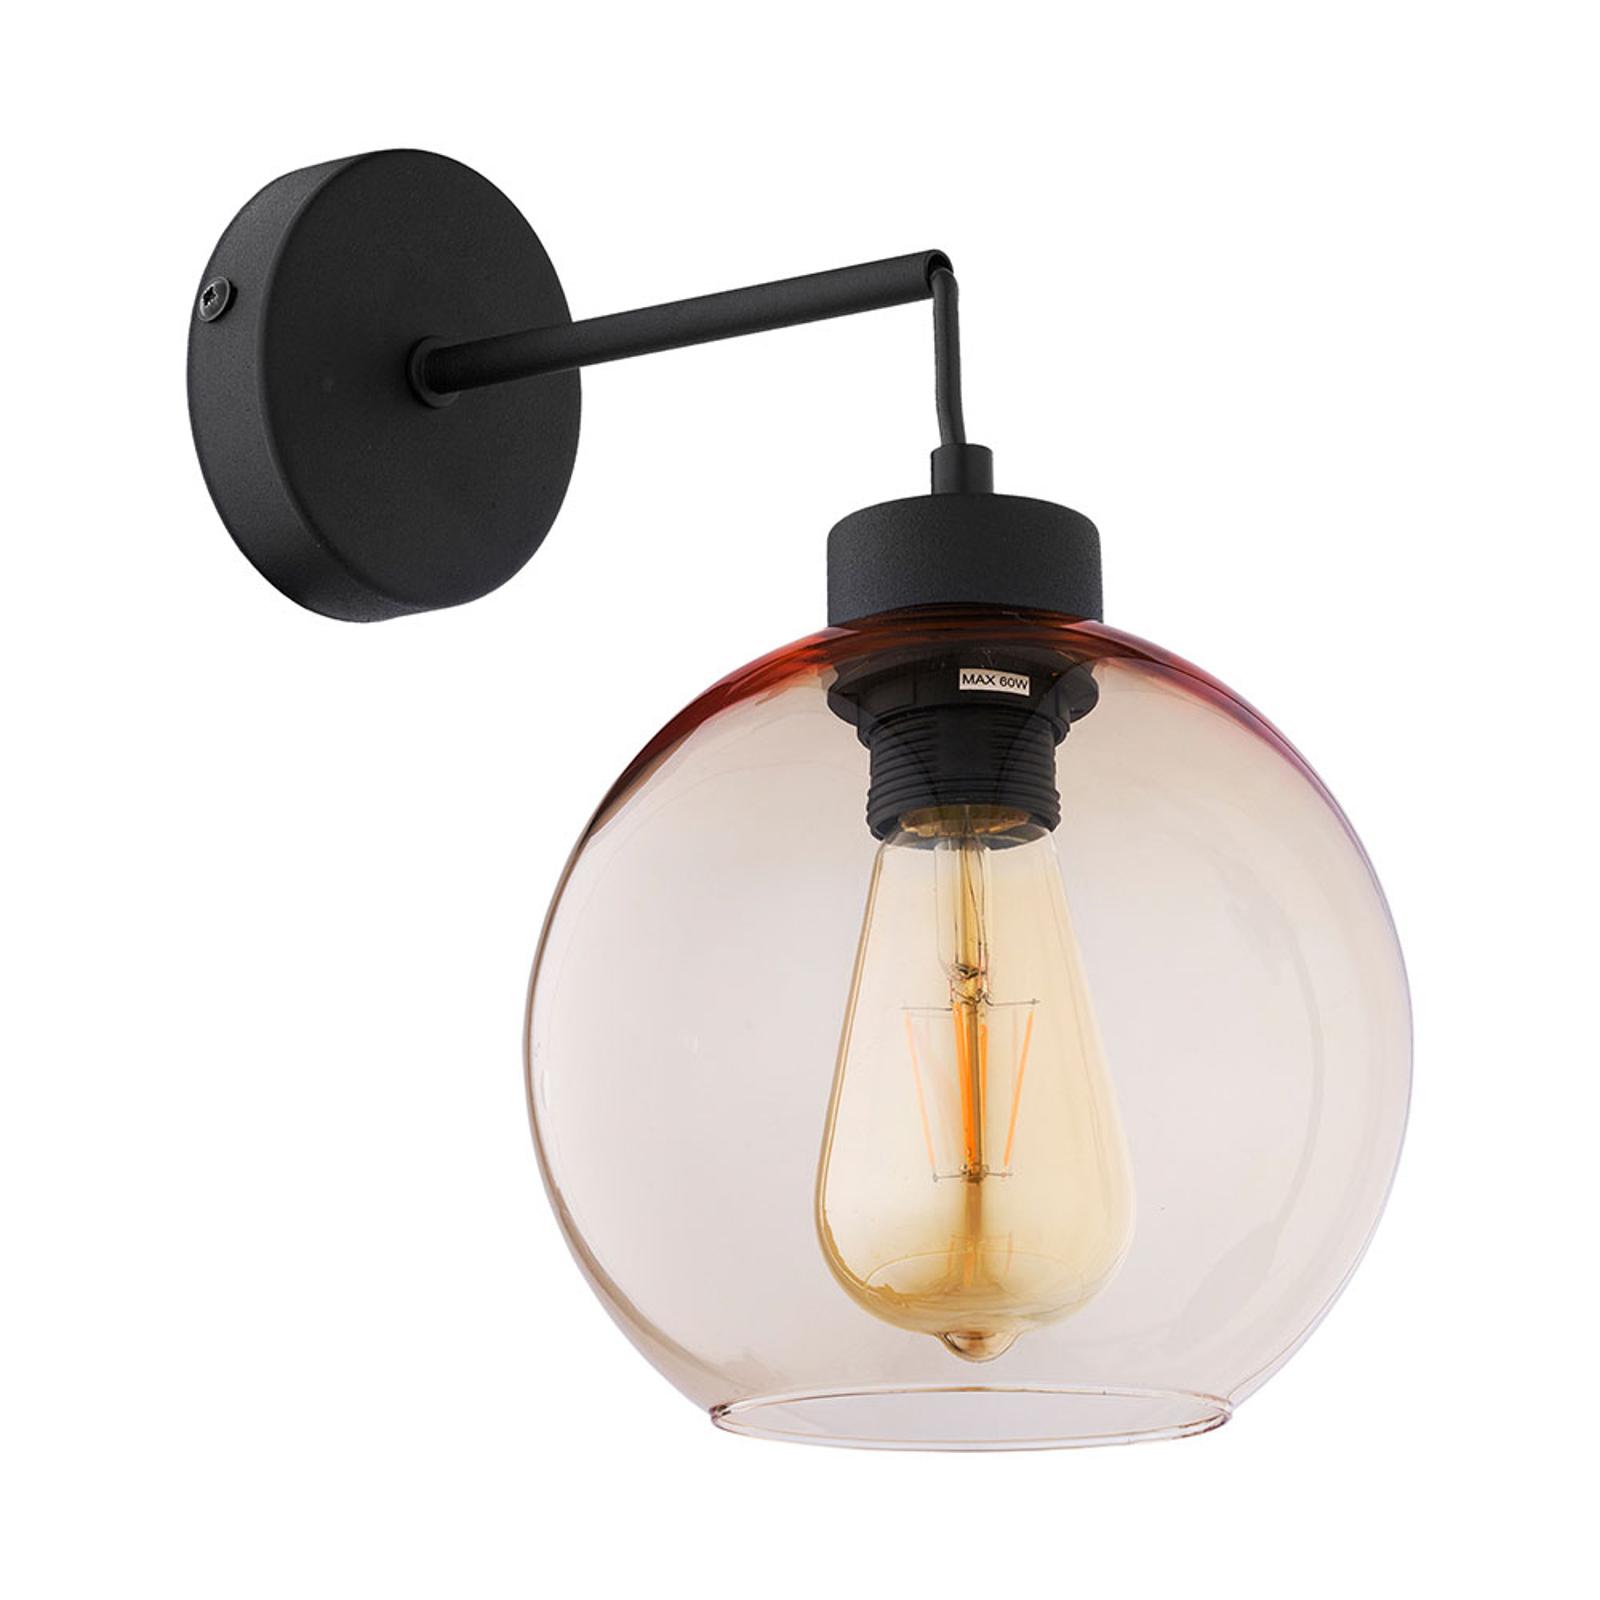 Wandlamp Cubus van glas, zwart/barnsteen